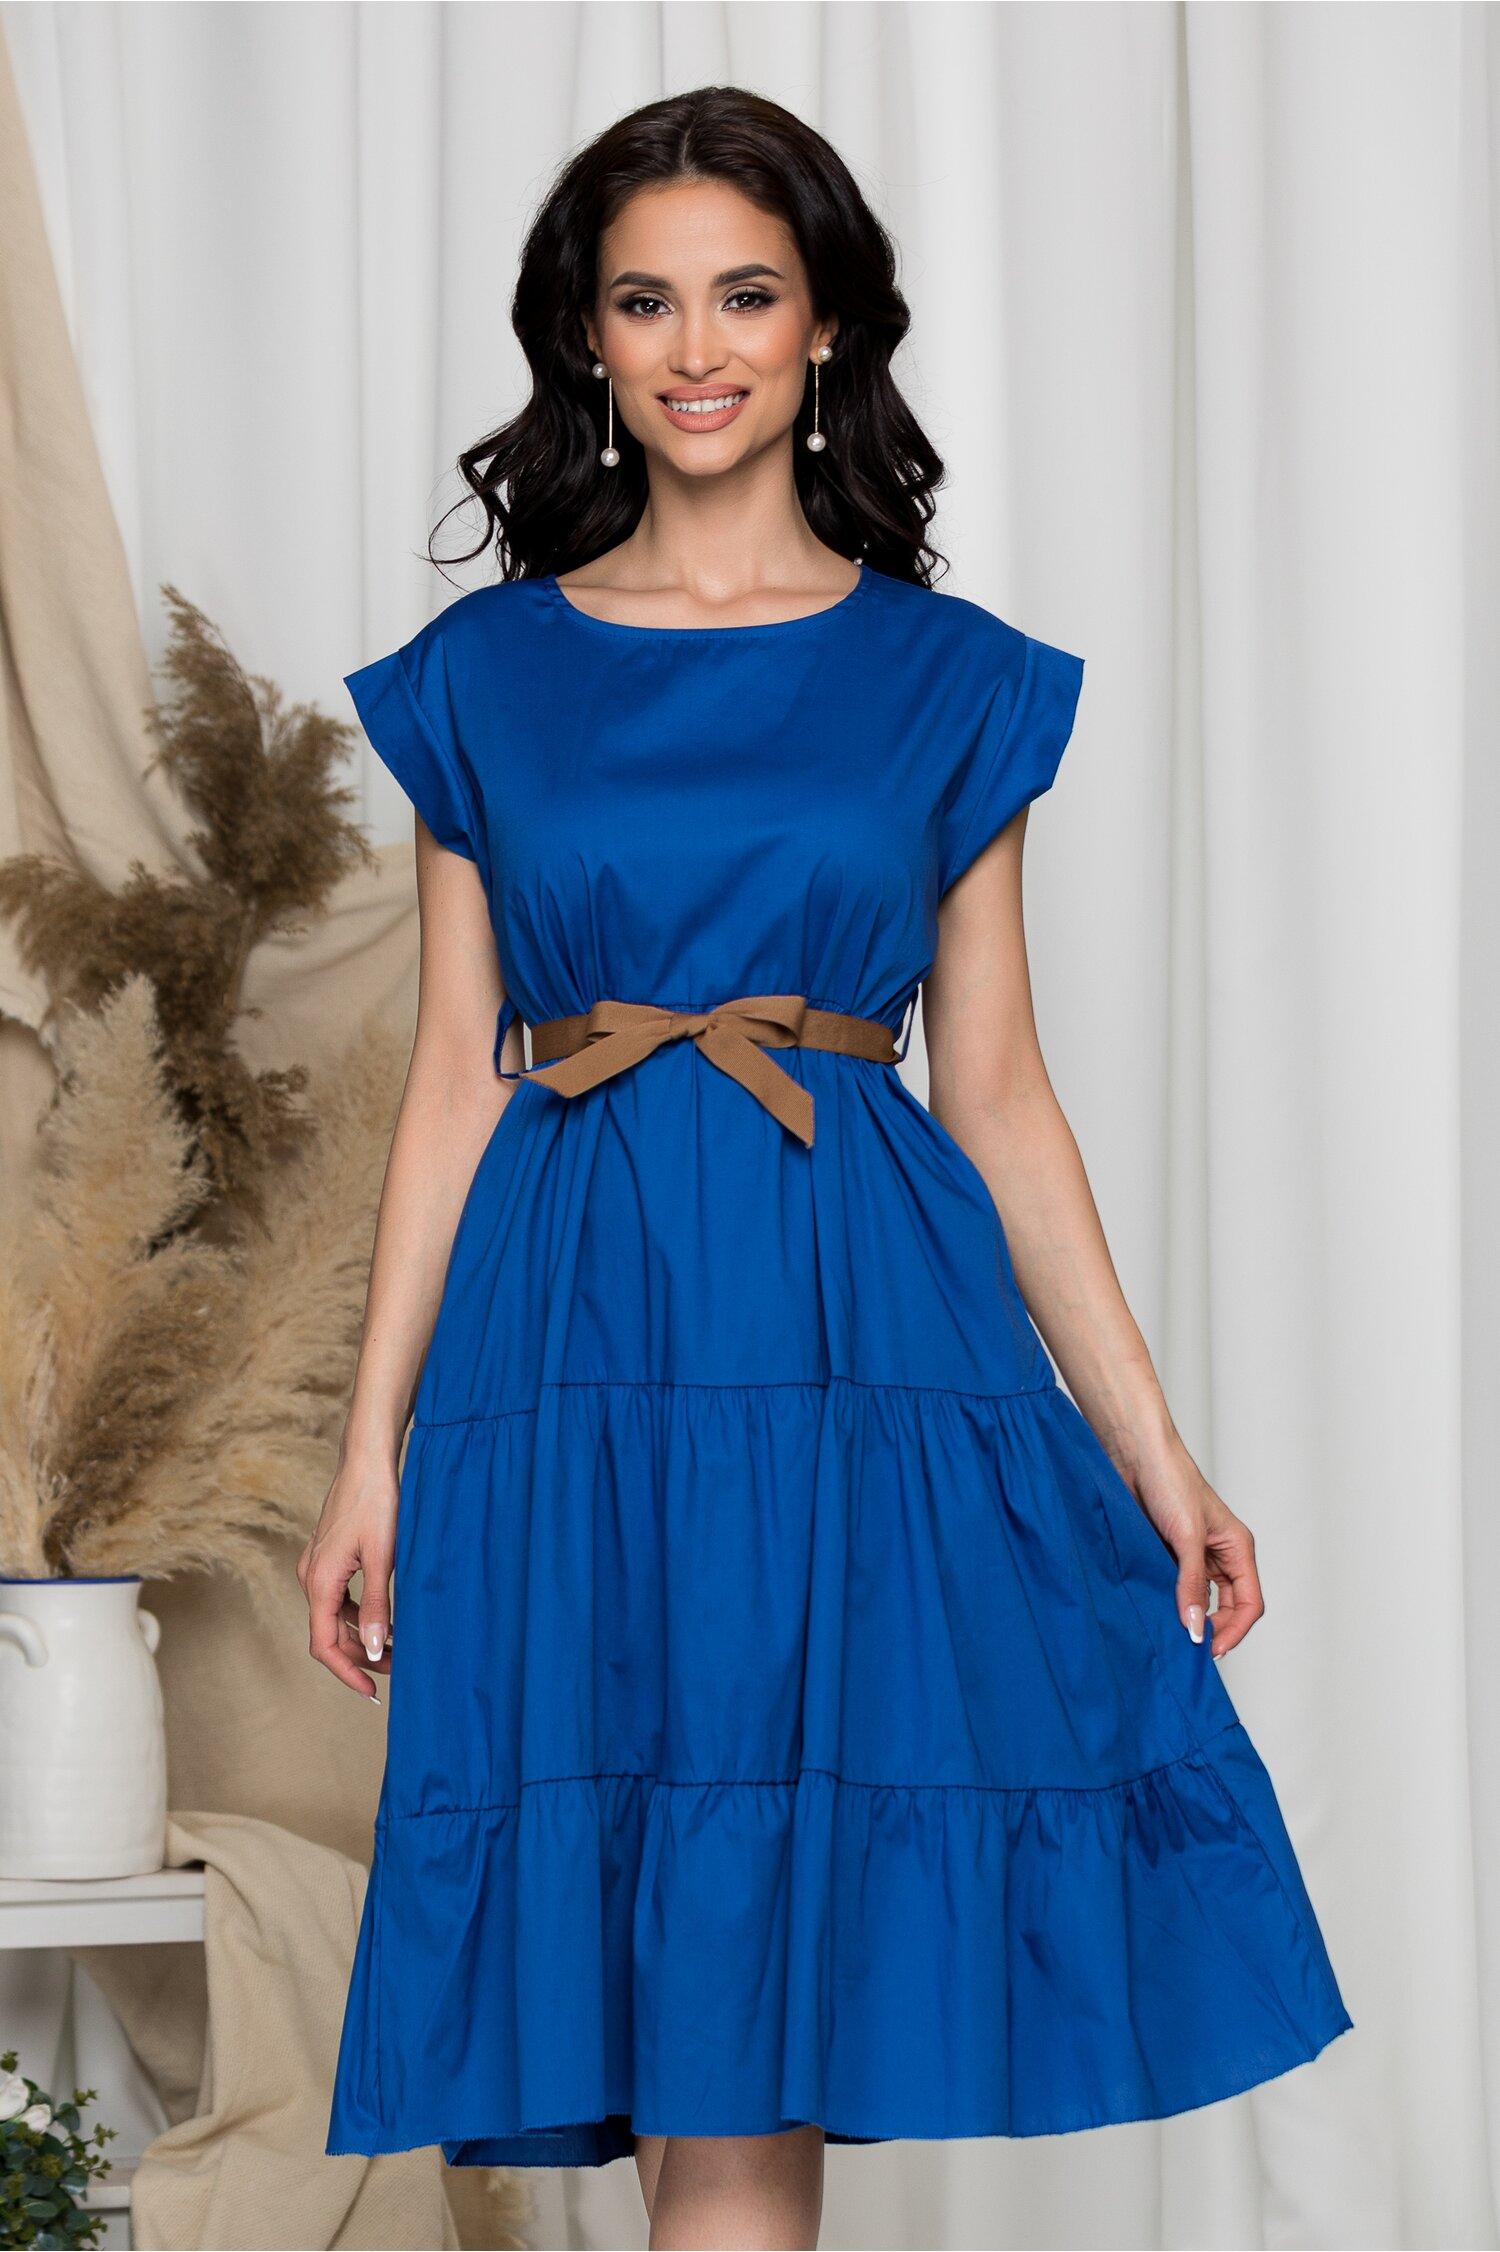 Rochie Sara albastra cu design tip volanase imagine dyfashion.ro 2021